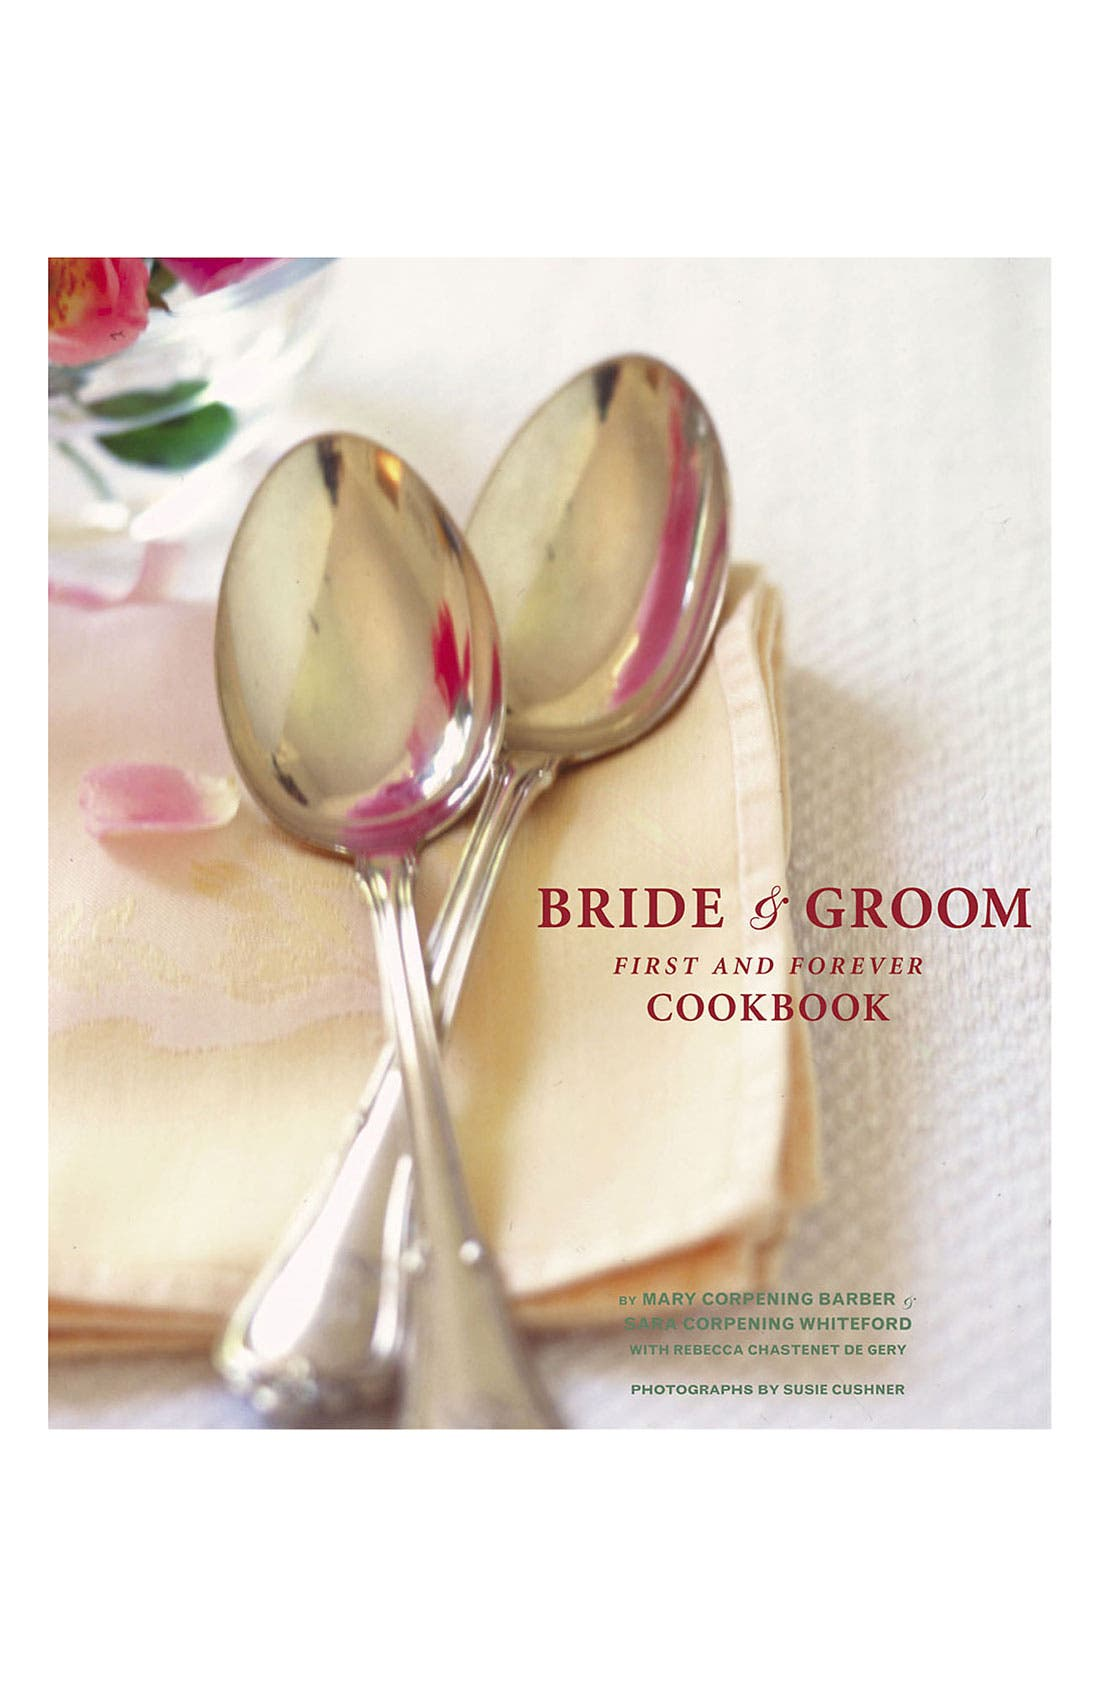 Alternate Image 1 Selected - 'Bride & Groom First and Forever' Cookbook